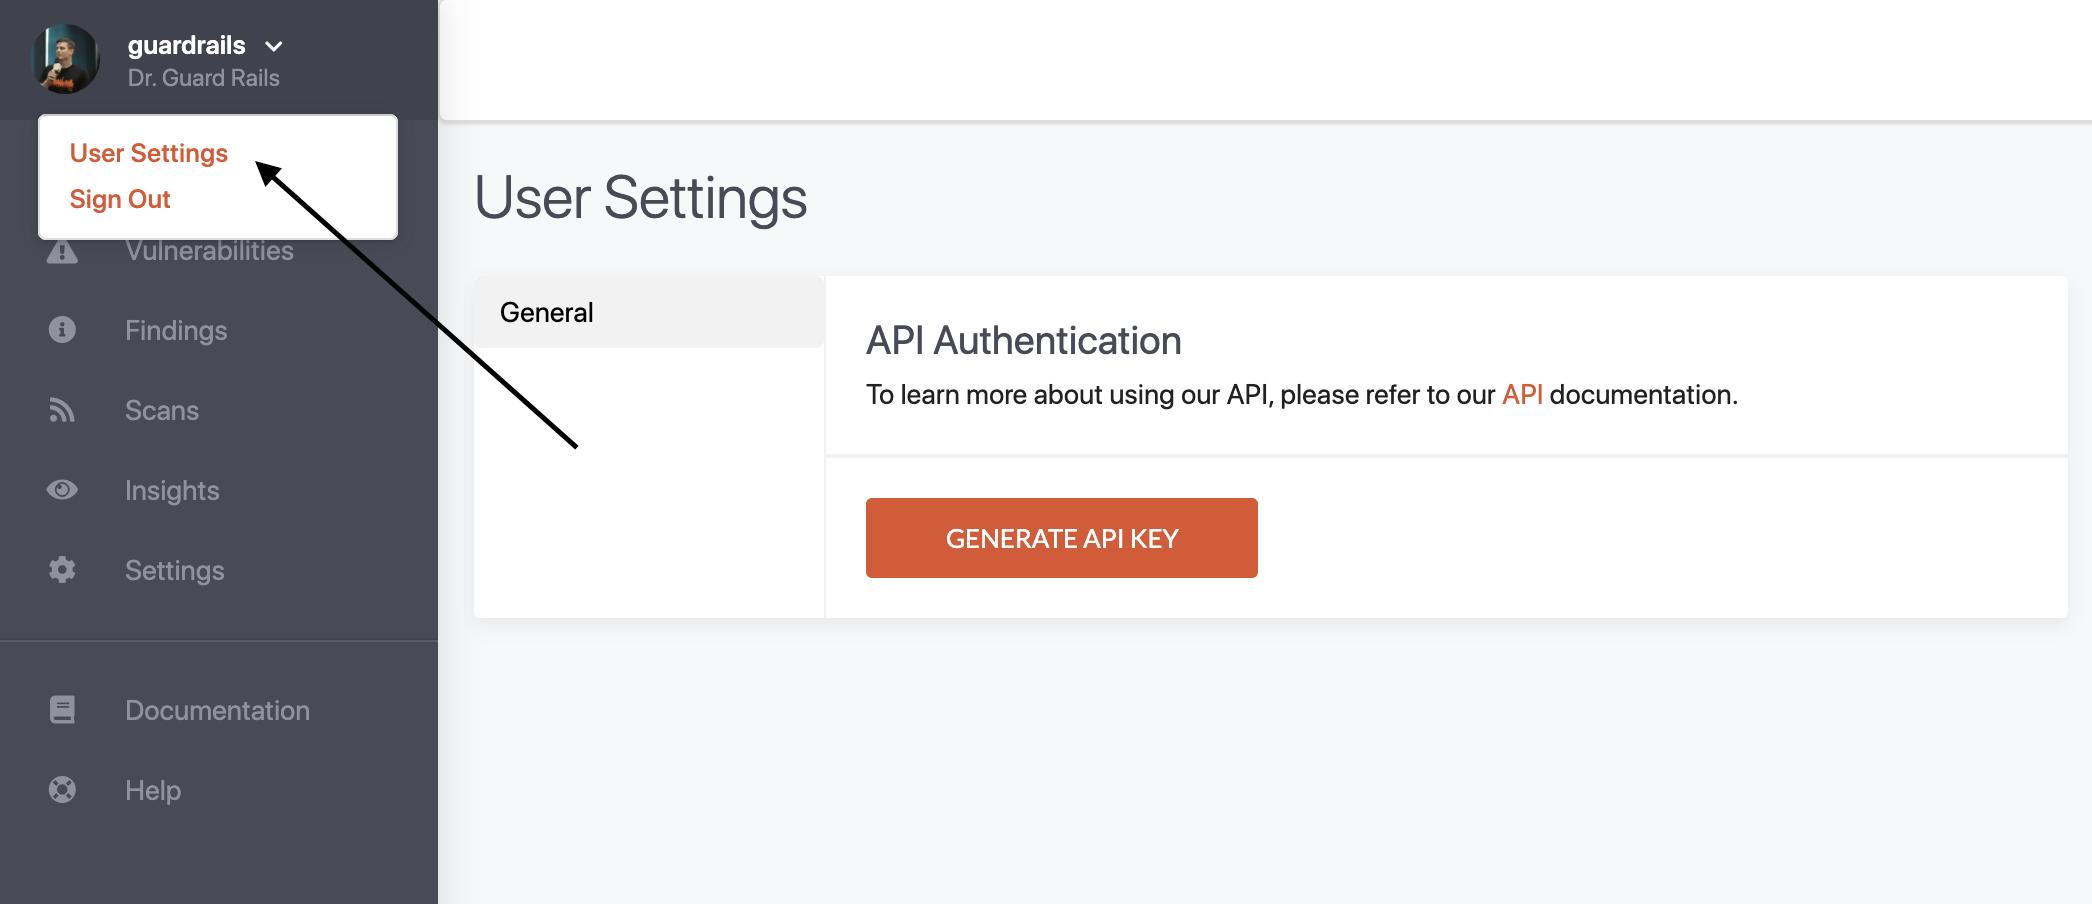 API Key Generation